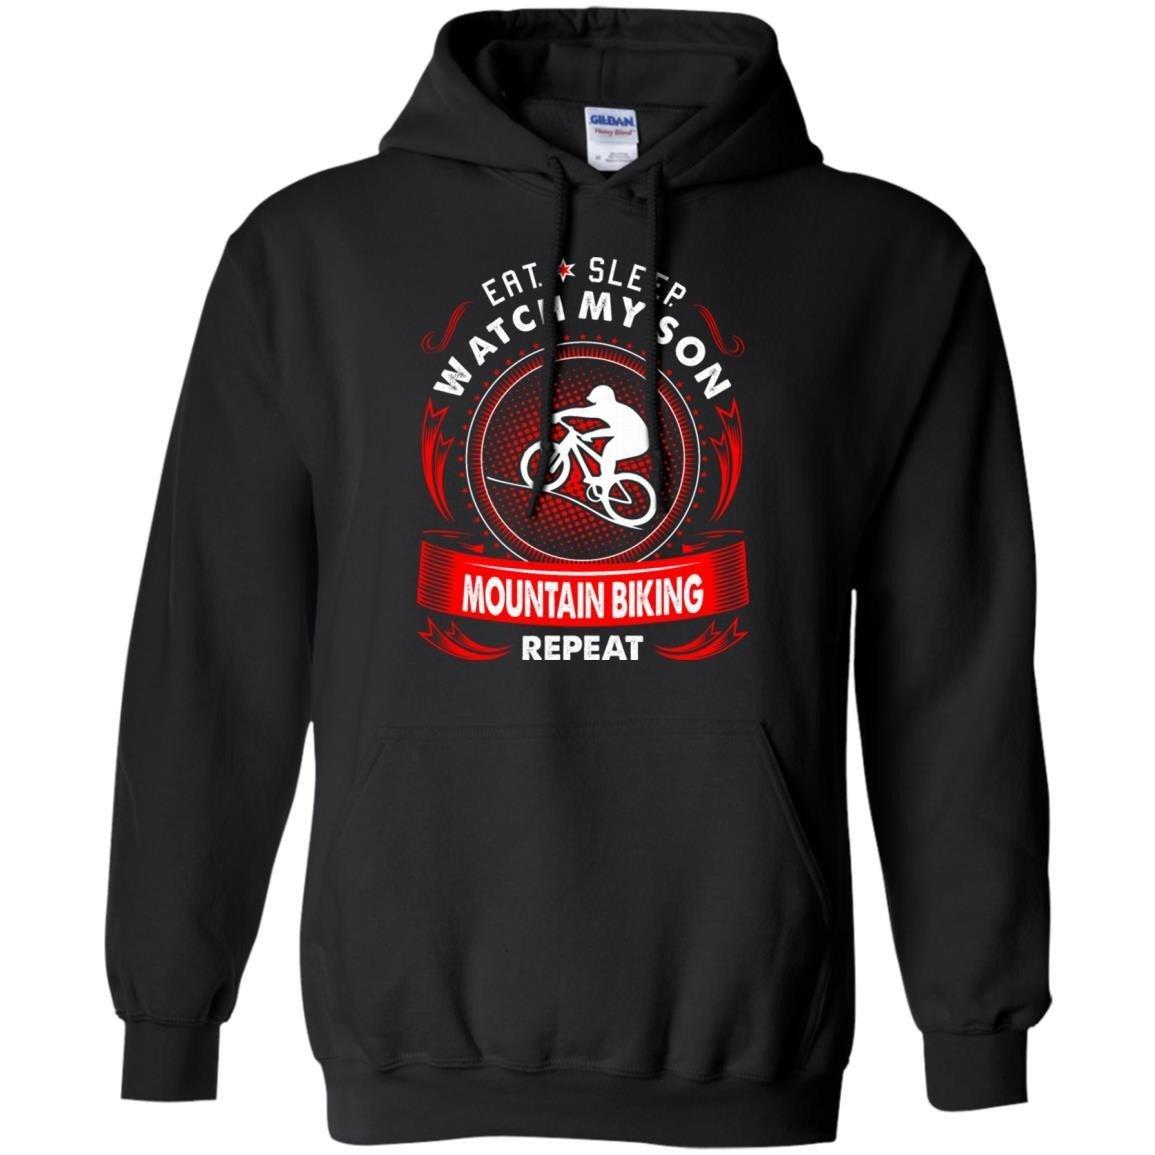 Eat Sleep Watch Son Mountain Biking Repeat T-Shirt Hoodie